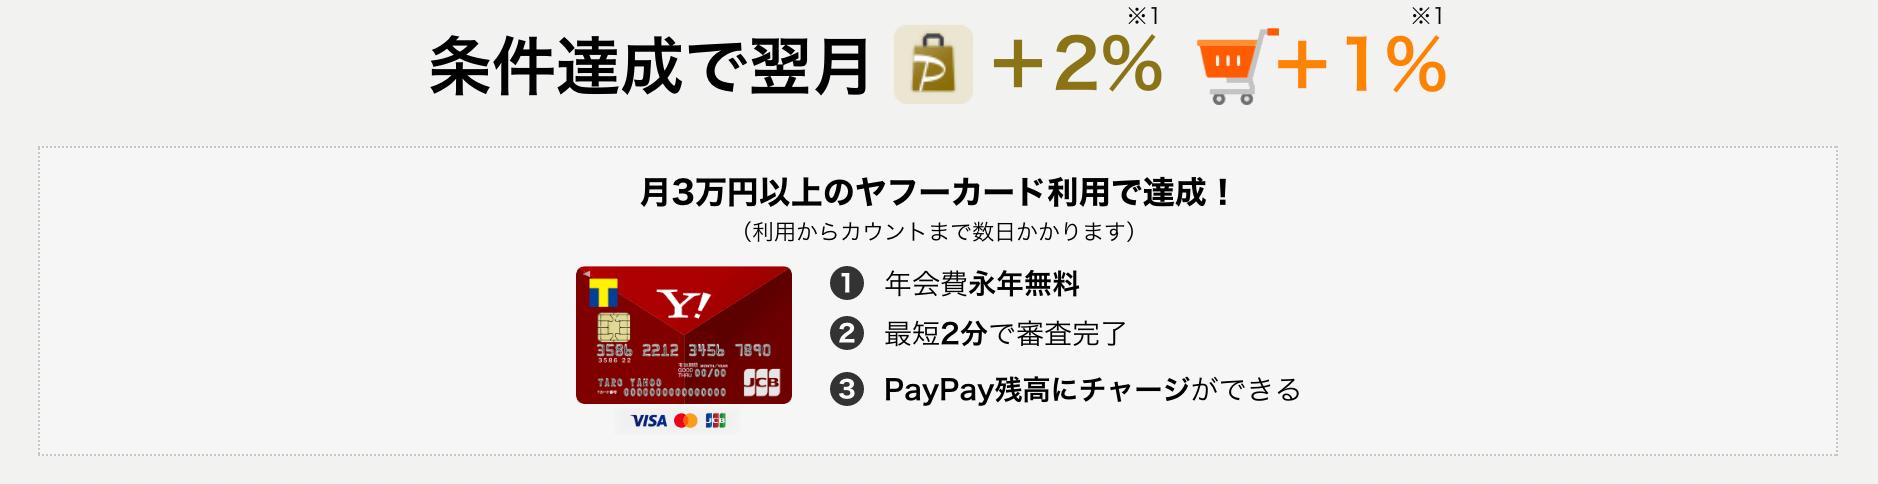 PayPay STEP Yahoo!カード利用